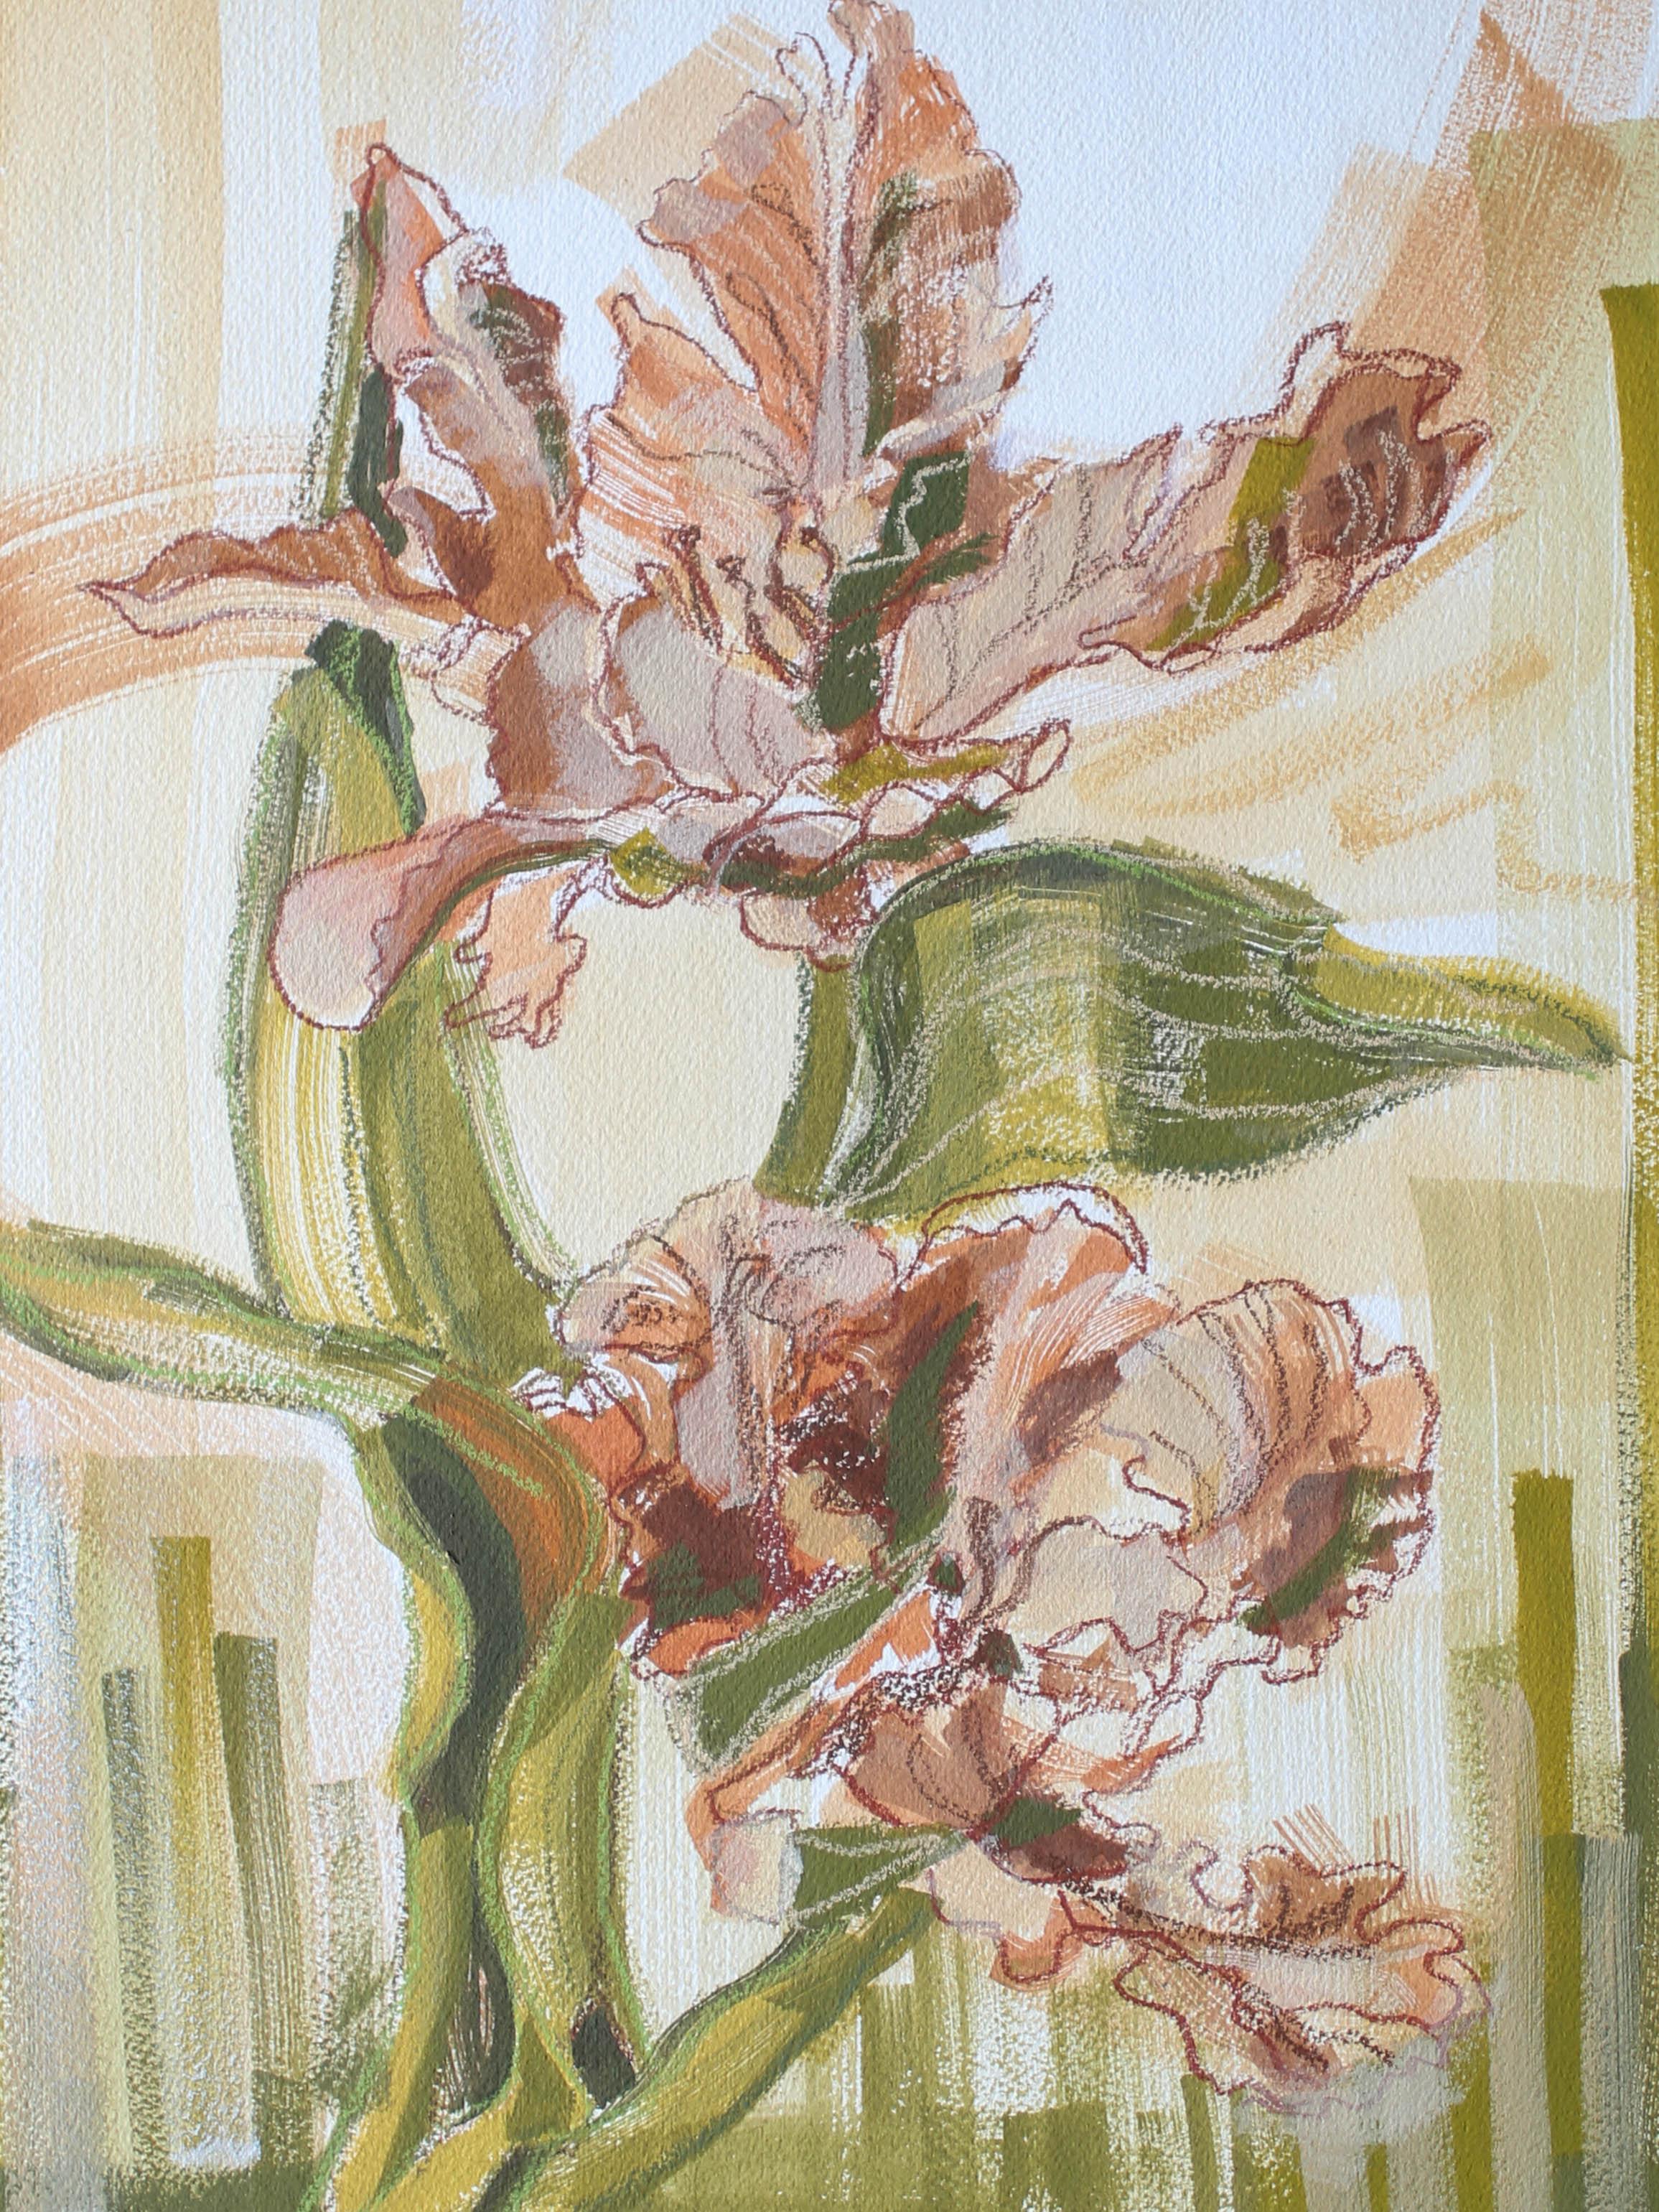 FLOWERS FOR THE MOTHER 12X16 Katherine Corden Art  #abstractflorals #flowerpainting #flowerstudy